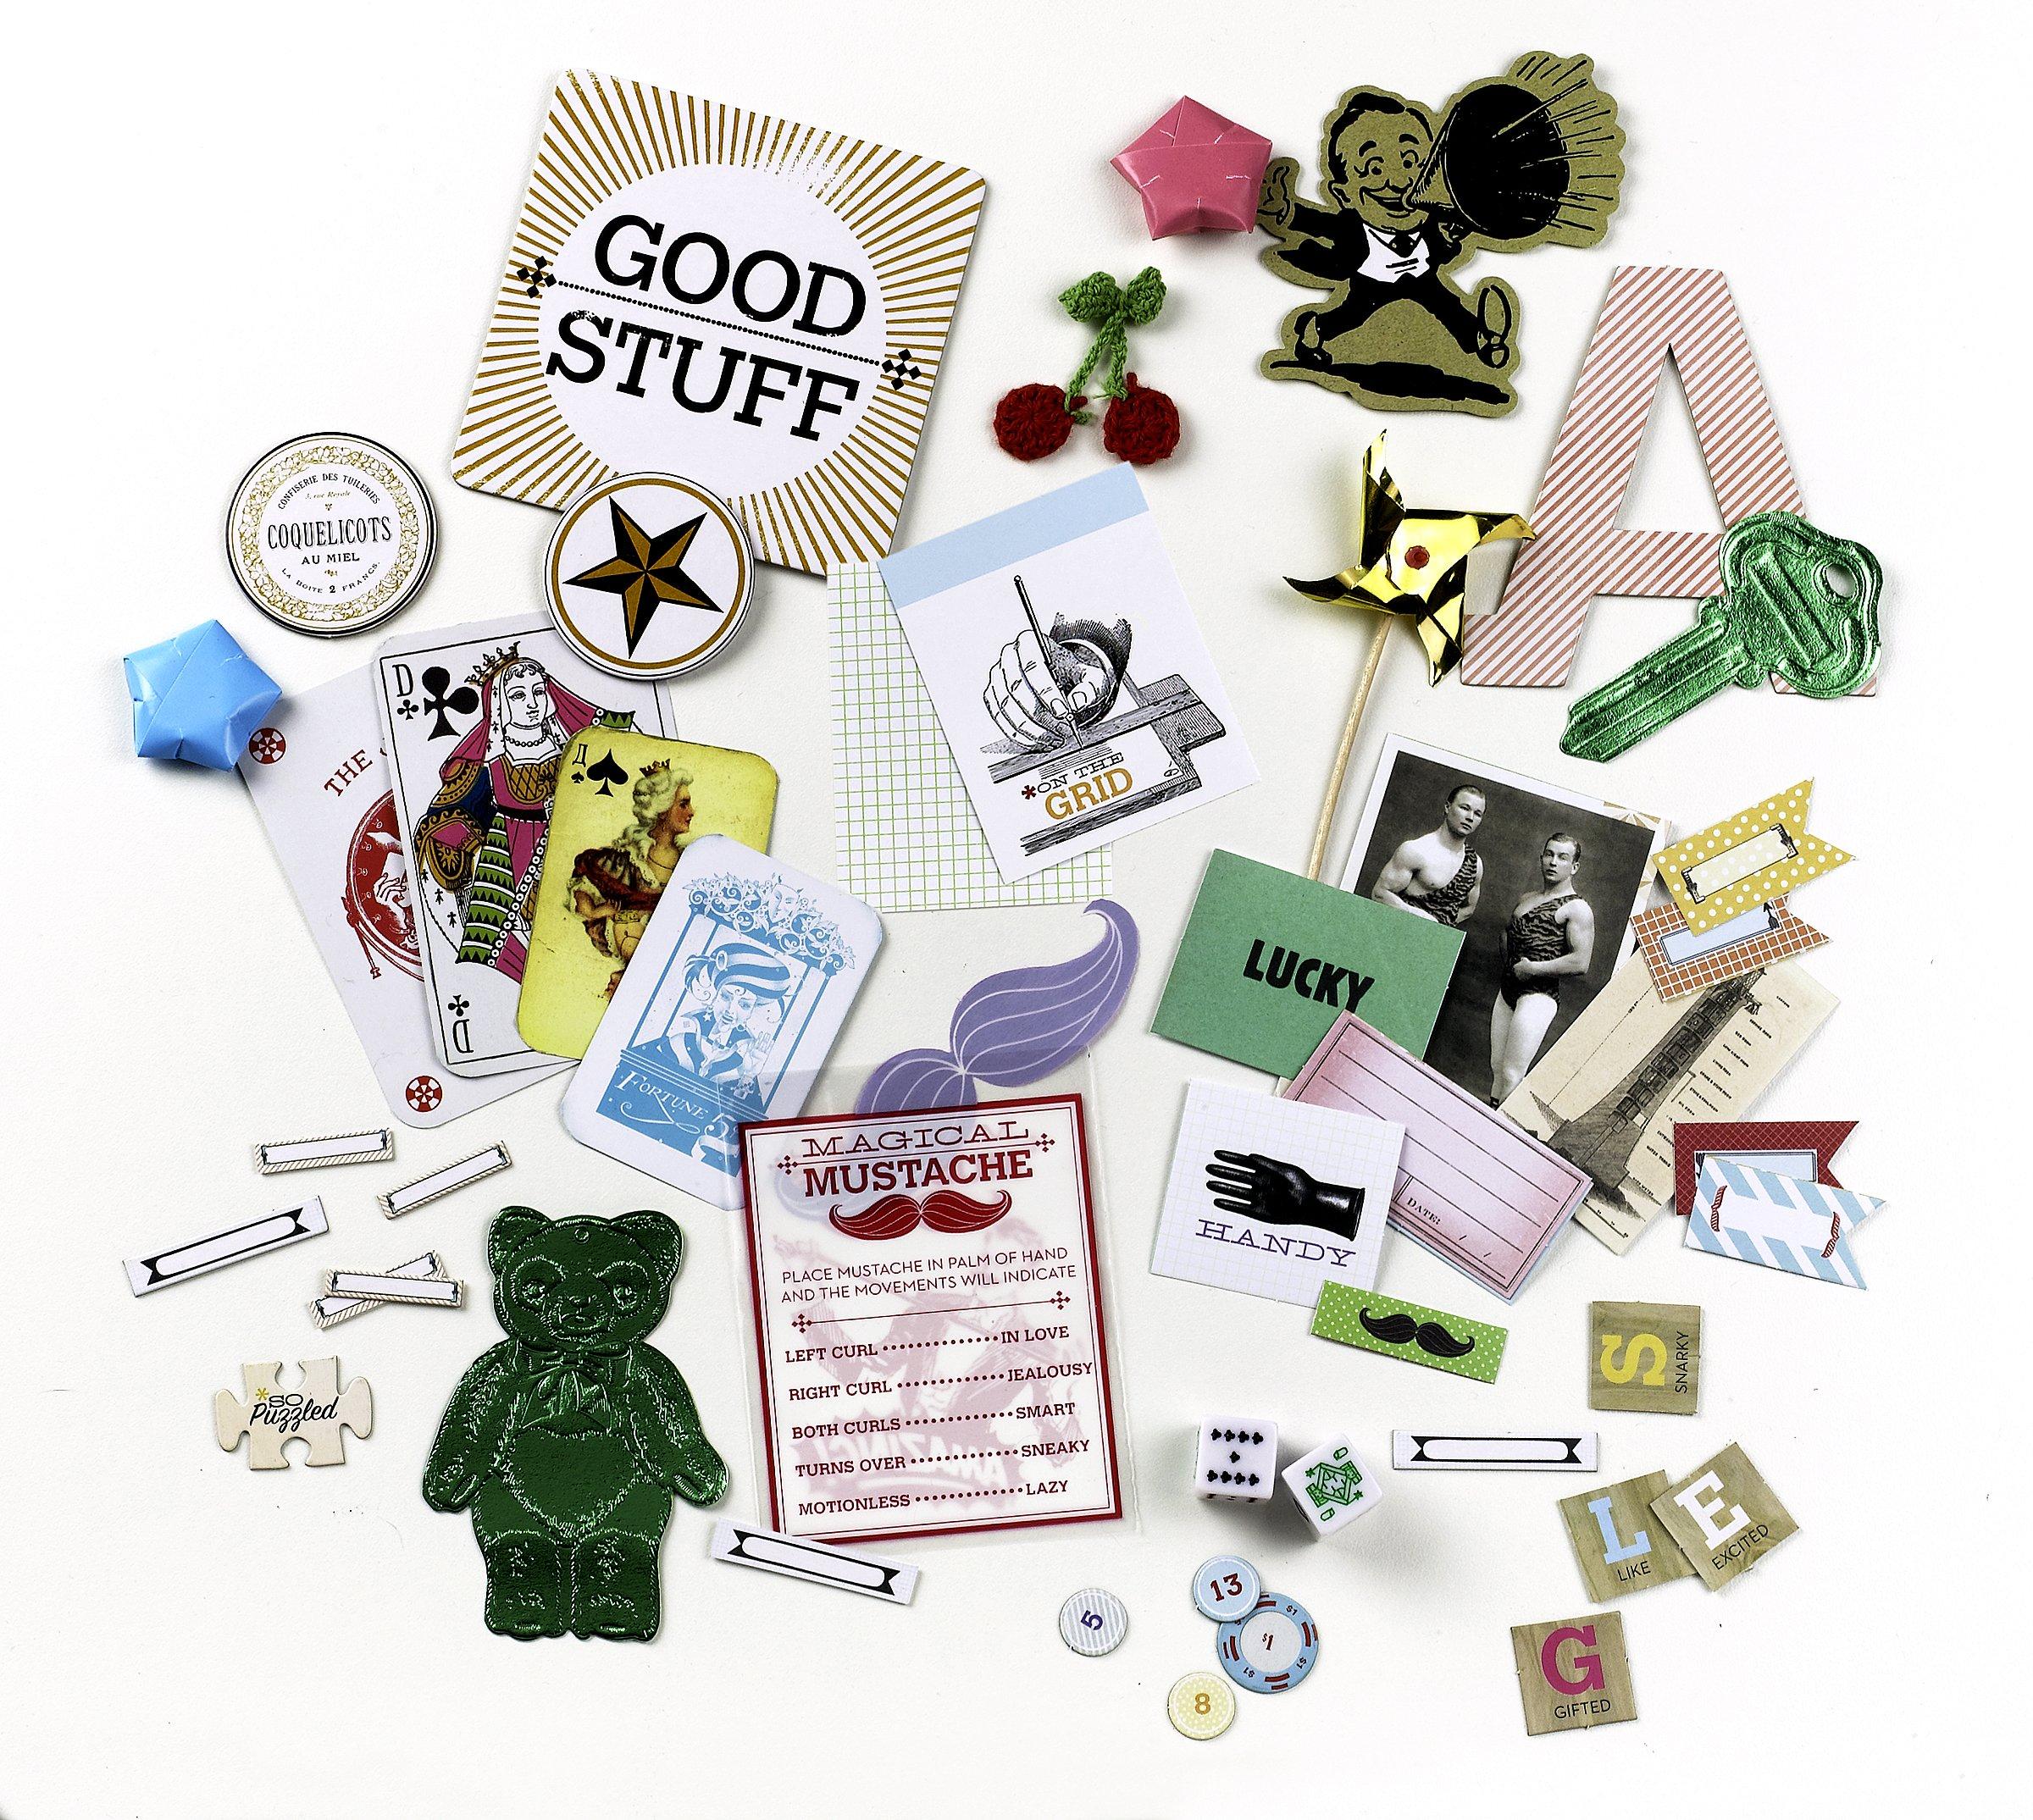 Smash Book Retro Grab Bag Home K & Co B00B8MY762 30-672024 Address Books